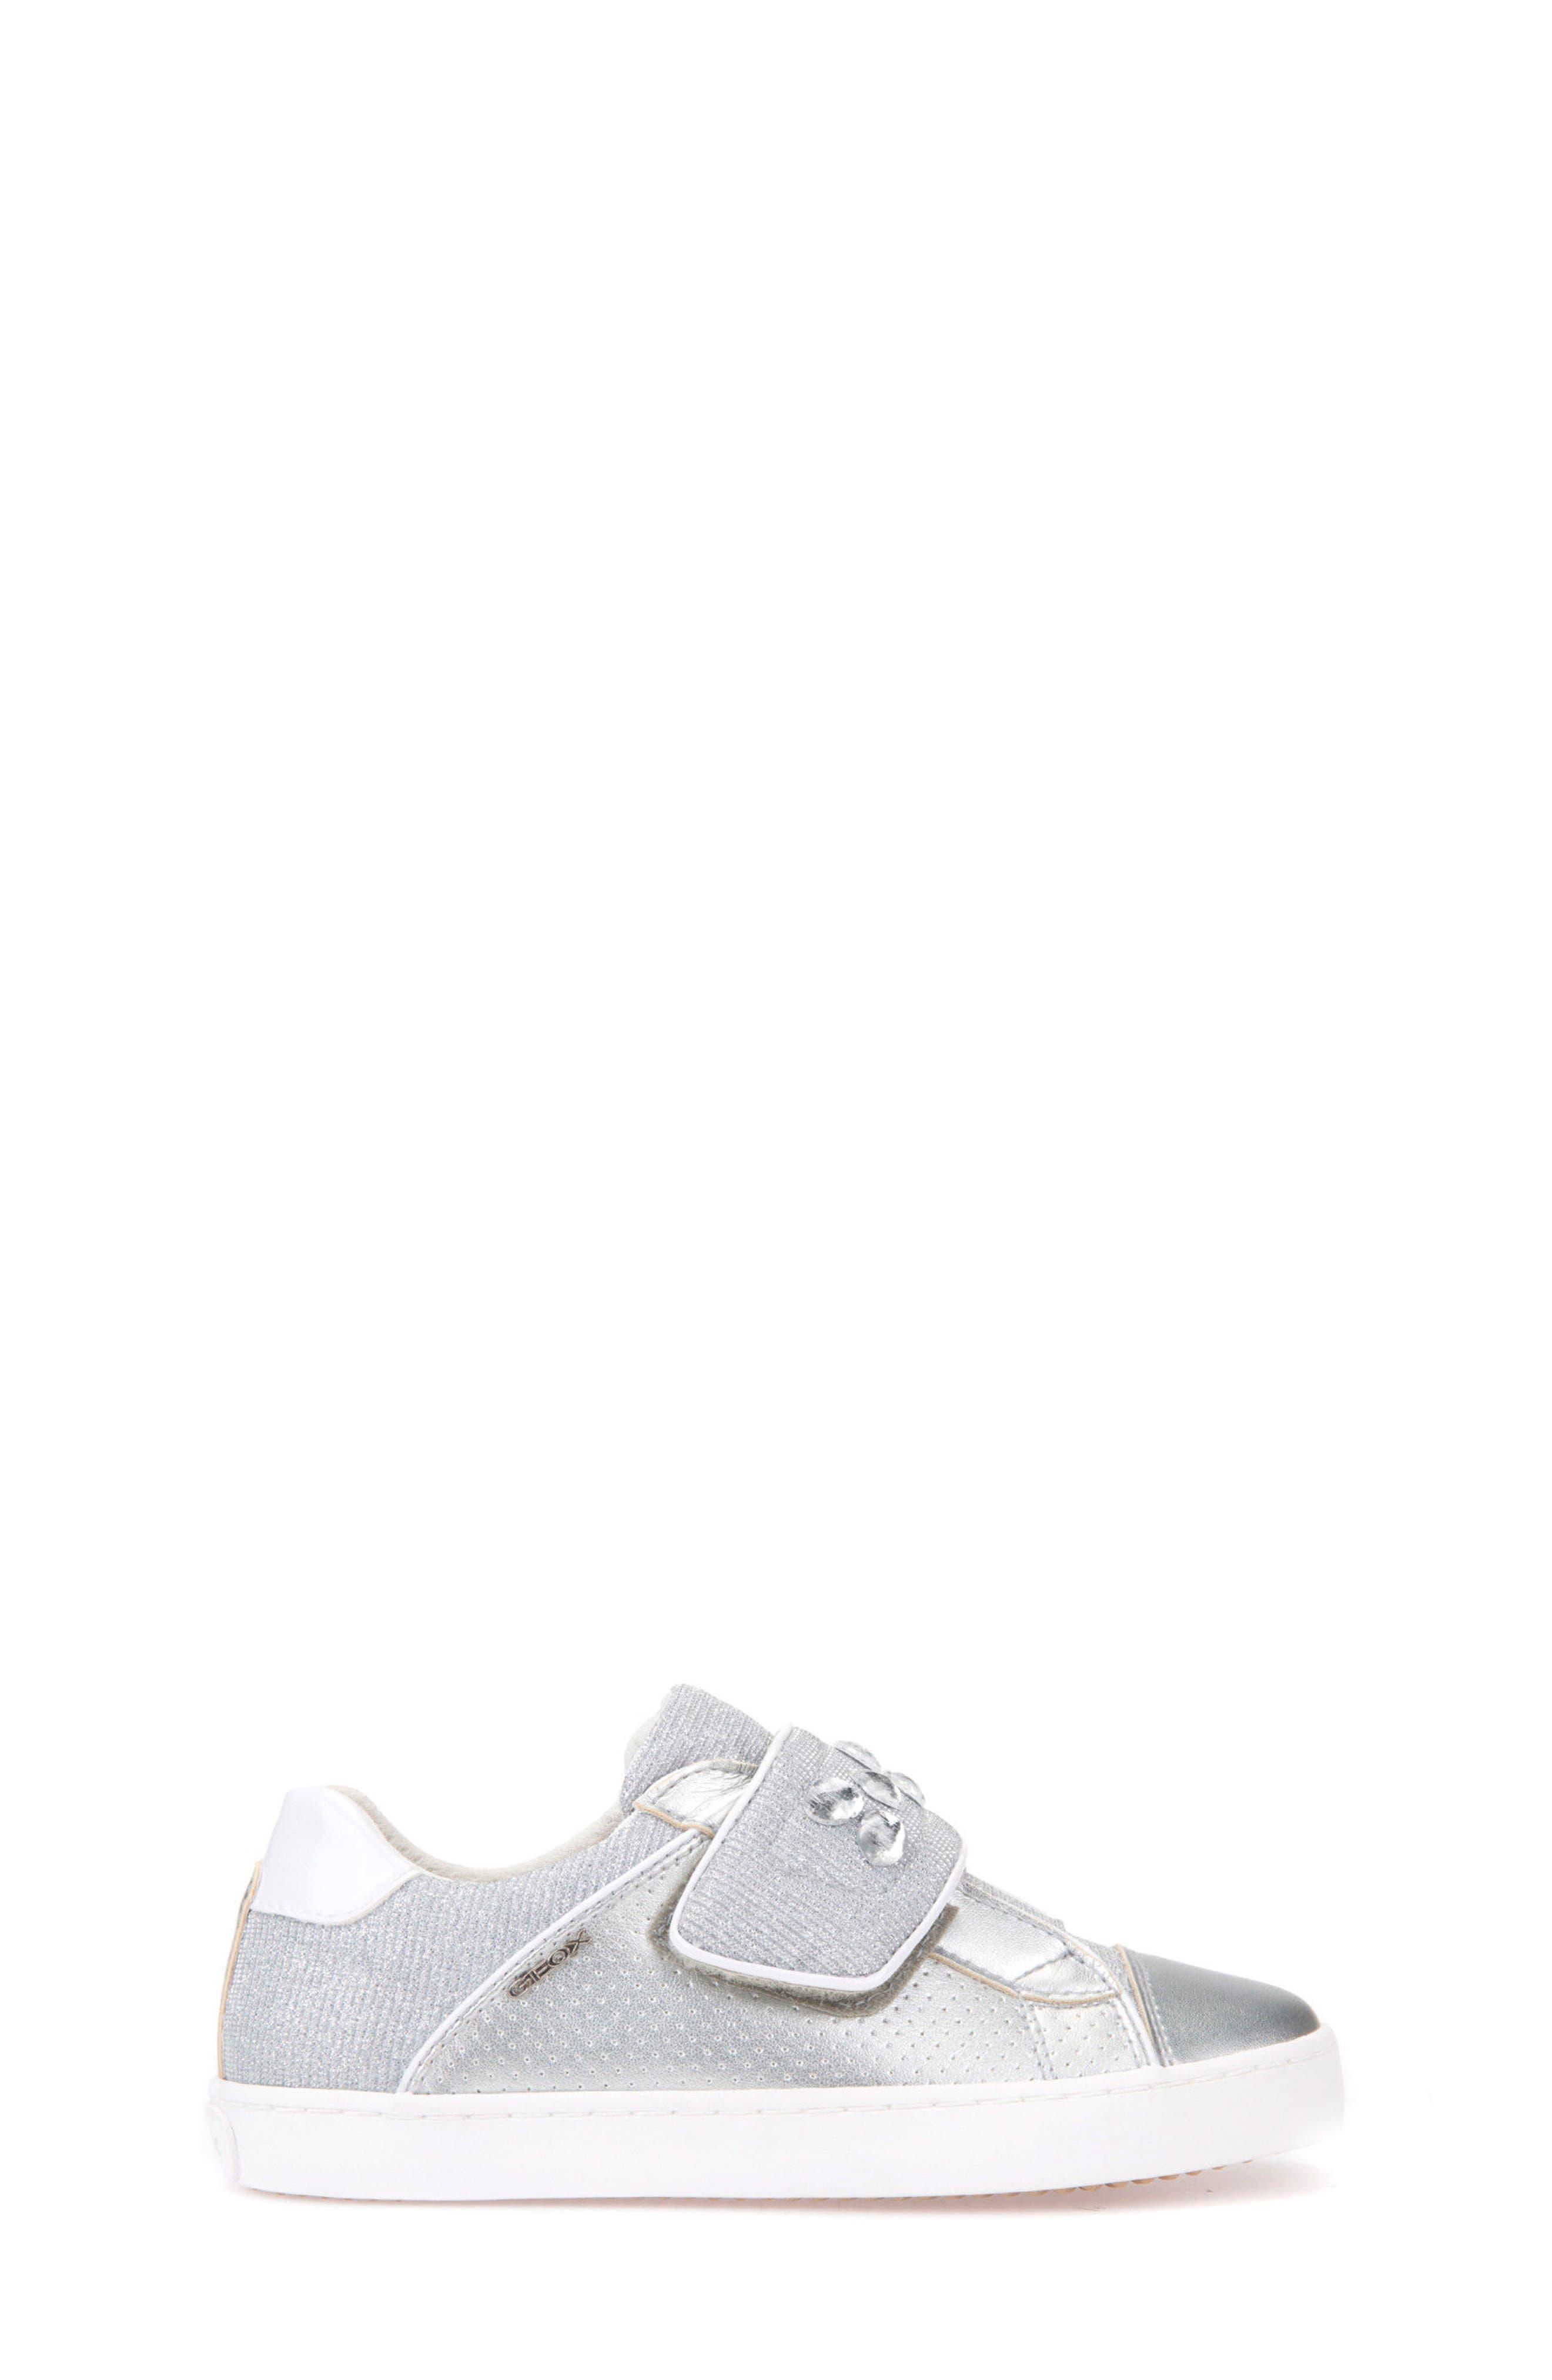 Kilwi Metallic Embellished Sneaker,                             Alternate thumbnail 3, color,                             SILVER